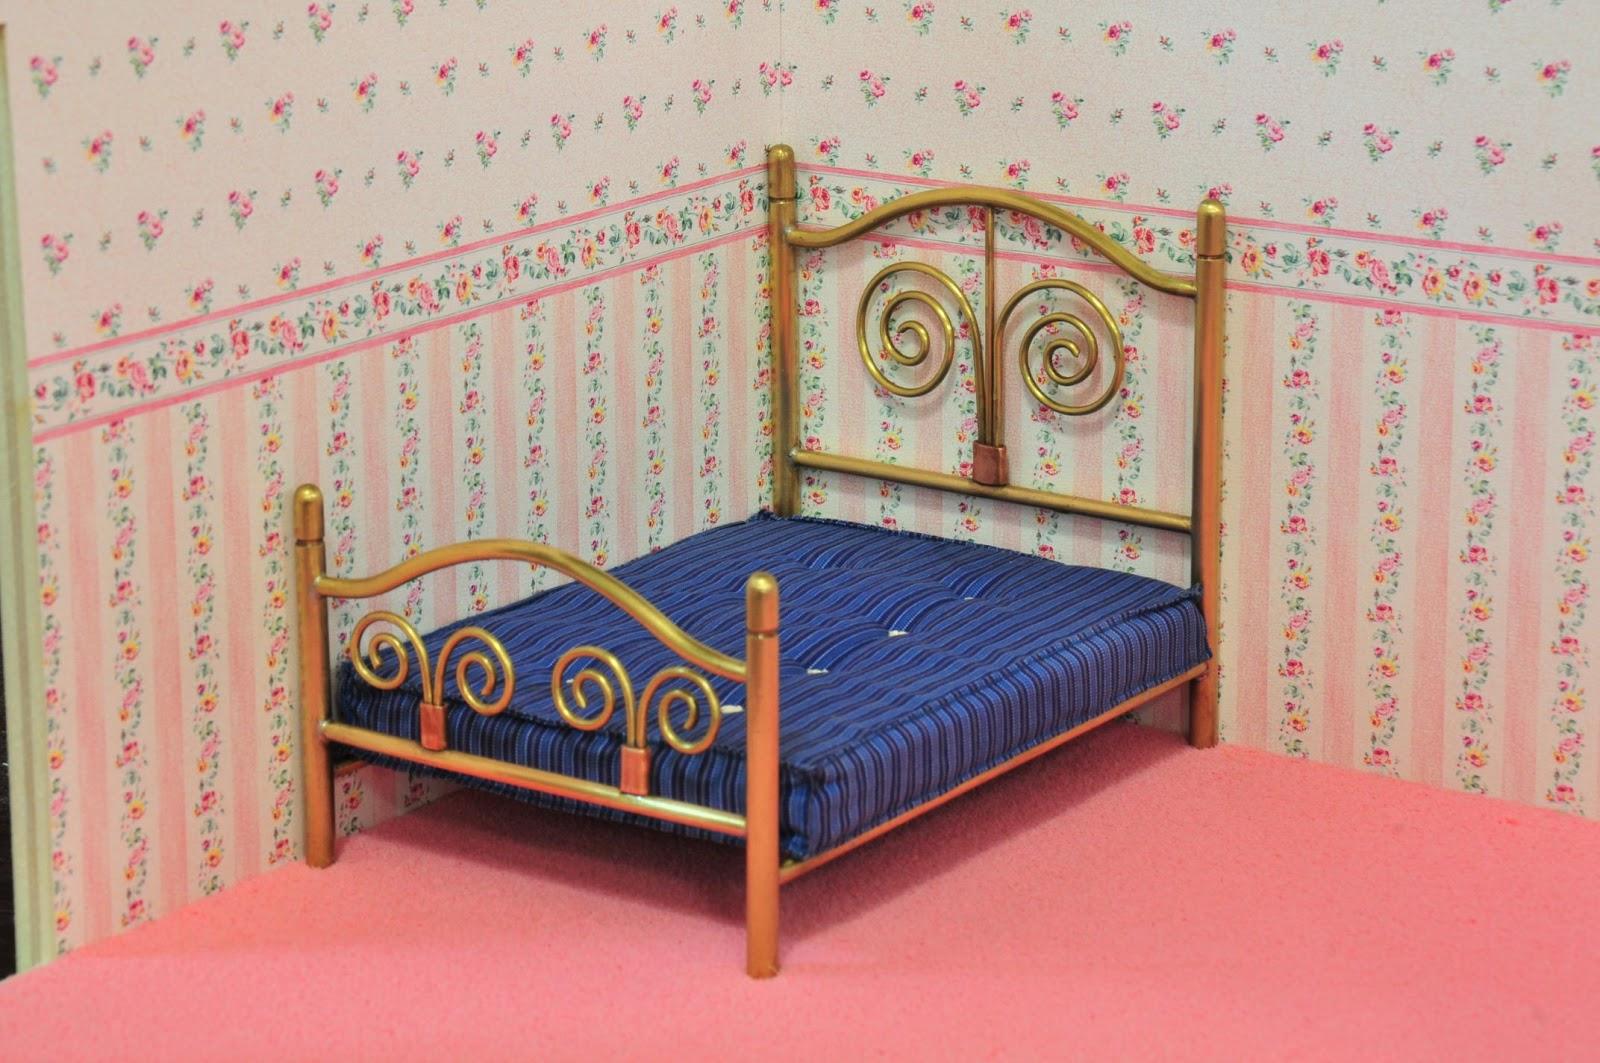 Drap miniatures camas de forja - Camas de forja ...